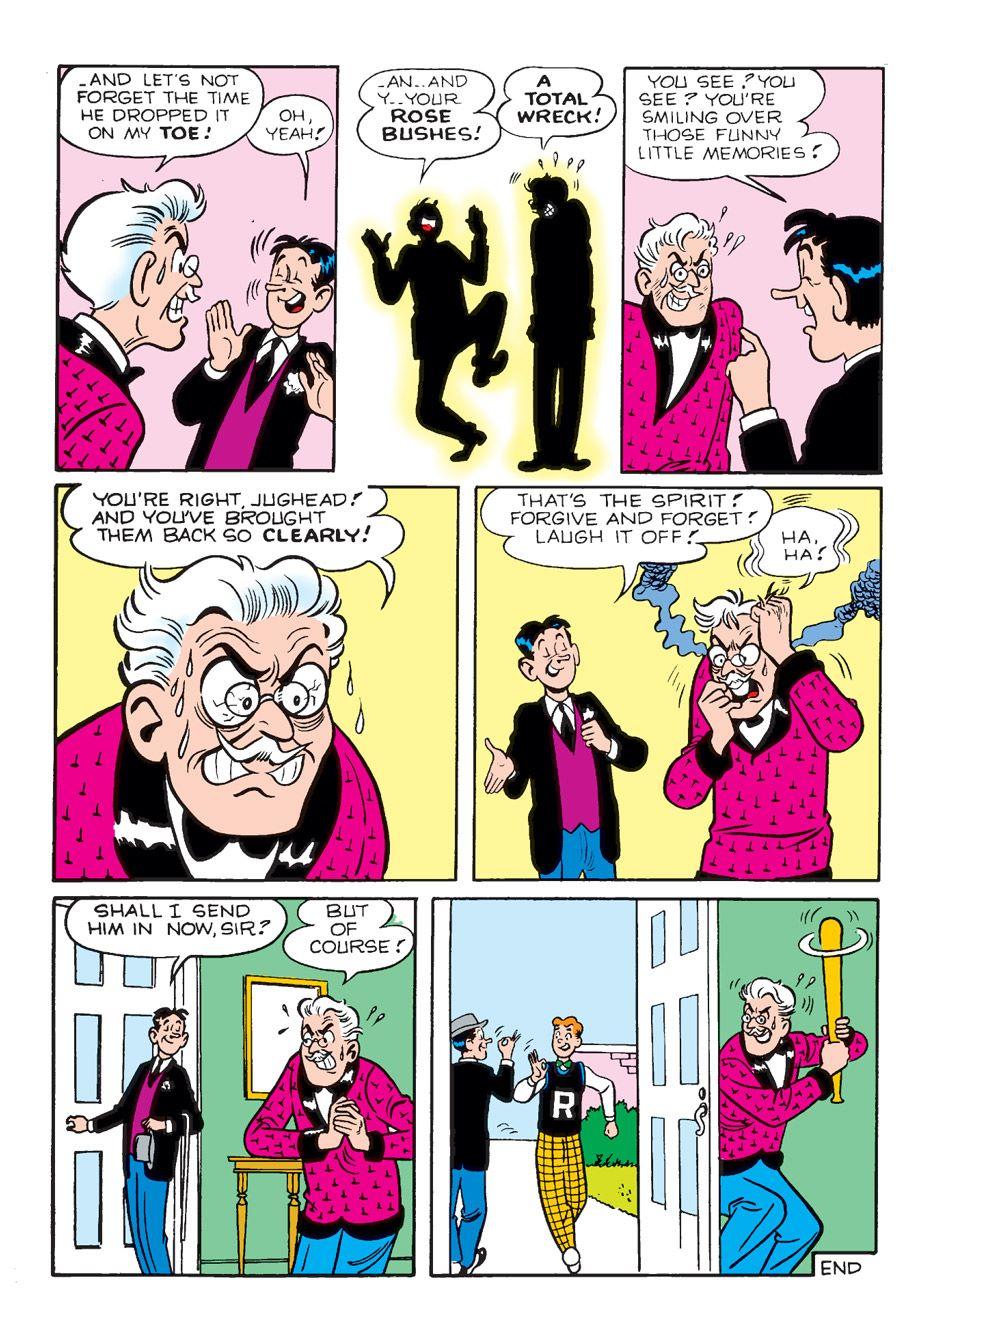 WorldOfArchieJumboComicsDigest_109-141 ComicList Previews: WORLD OF ARCHIE JUMBO COMICS DIGEST #109